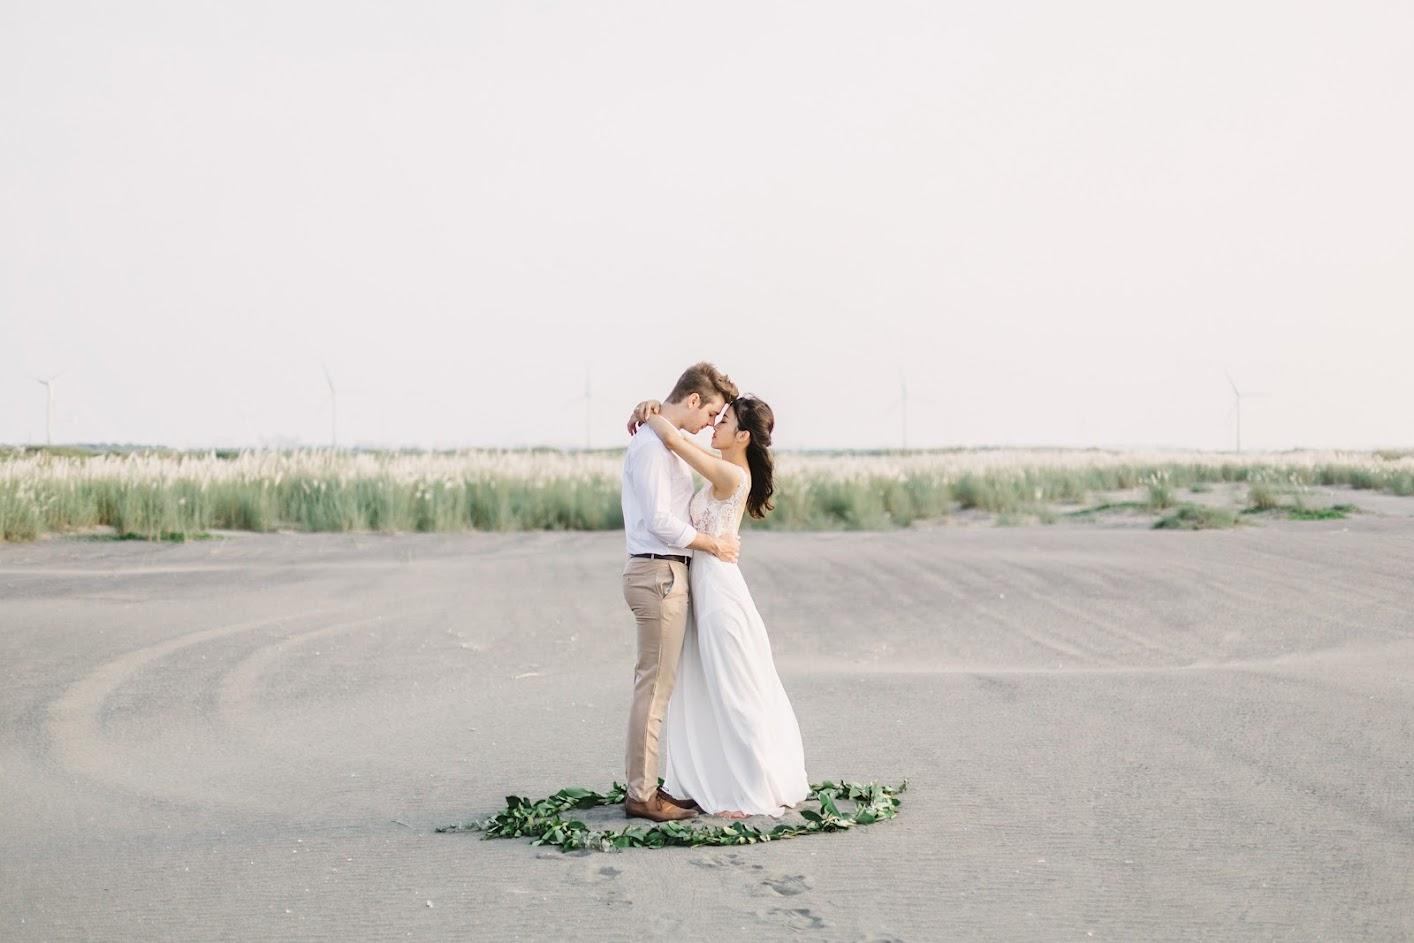 ,AG美式婚紗,AG自助婚紗,Fine art婚紗,AG婚紗,婚攝Adam , 主郁,美式婚禮攝影,美式婚禮紀錄 ,Amazing Grace攝影美學,台中自助婚紗推薦,自然清新 婚紗